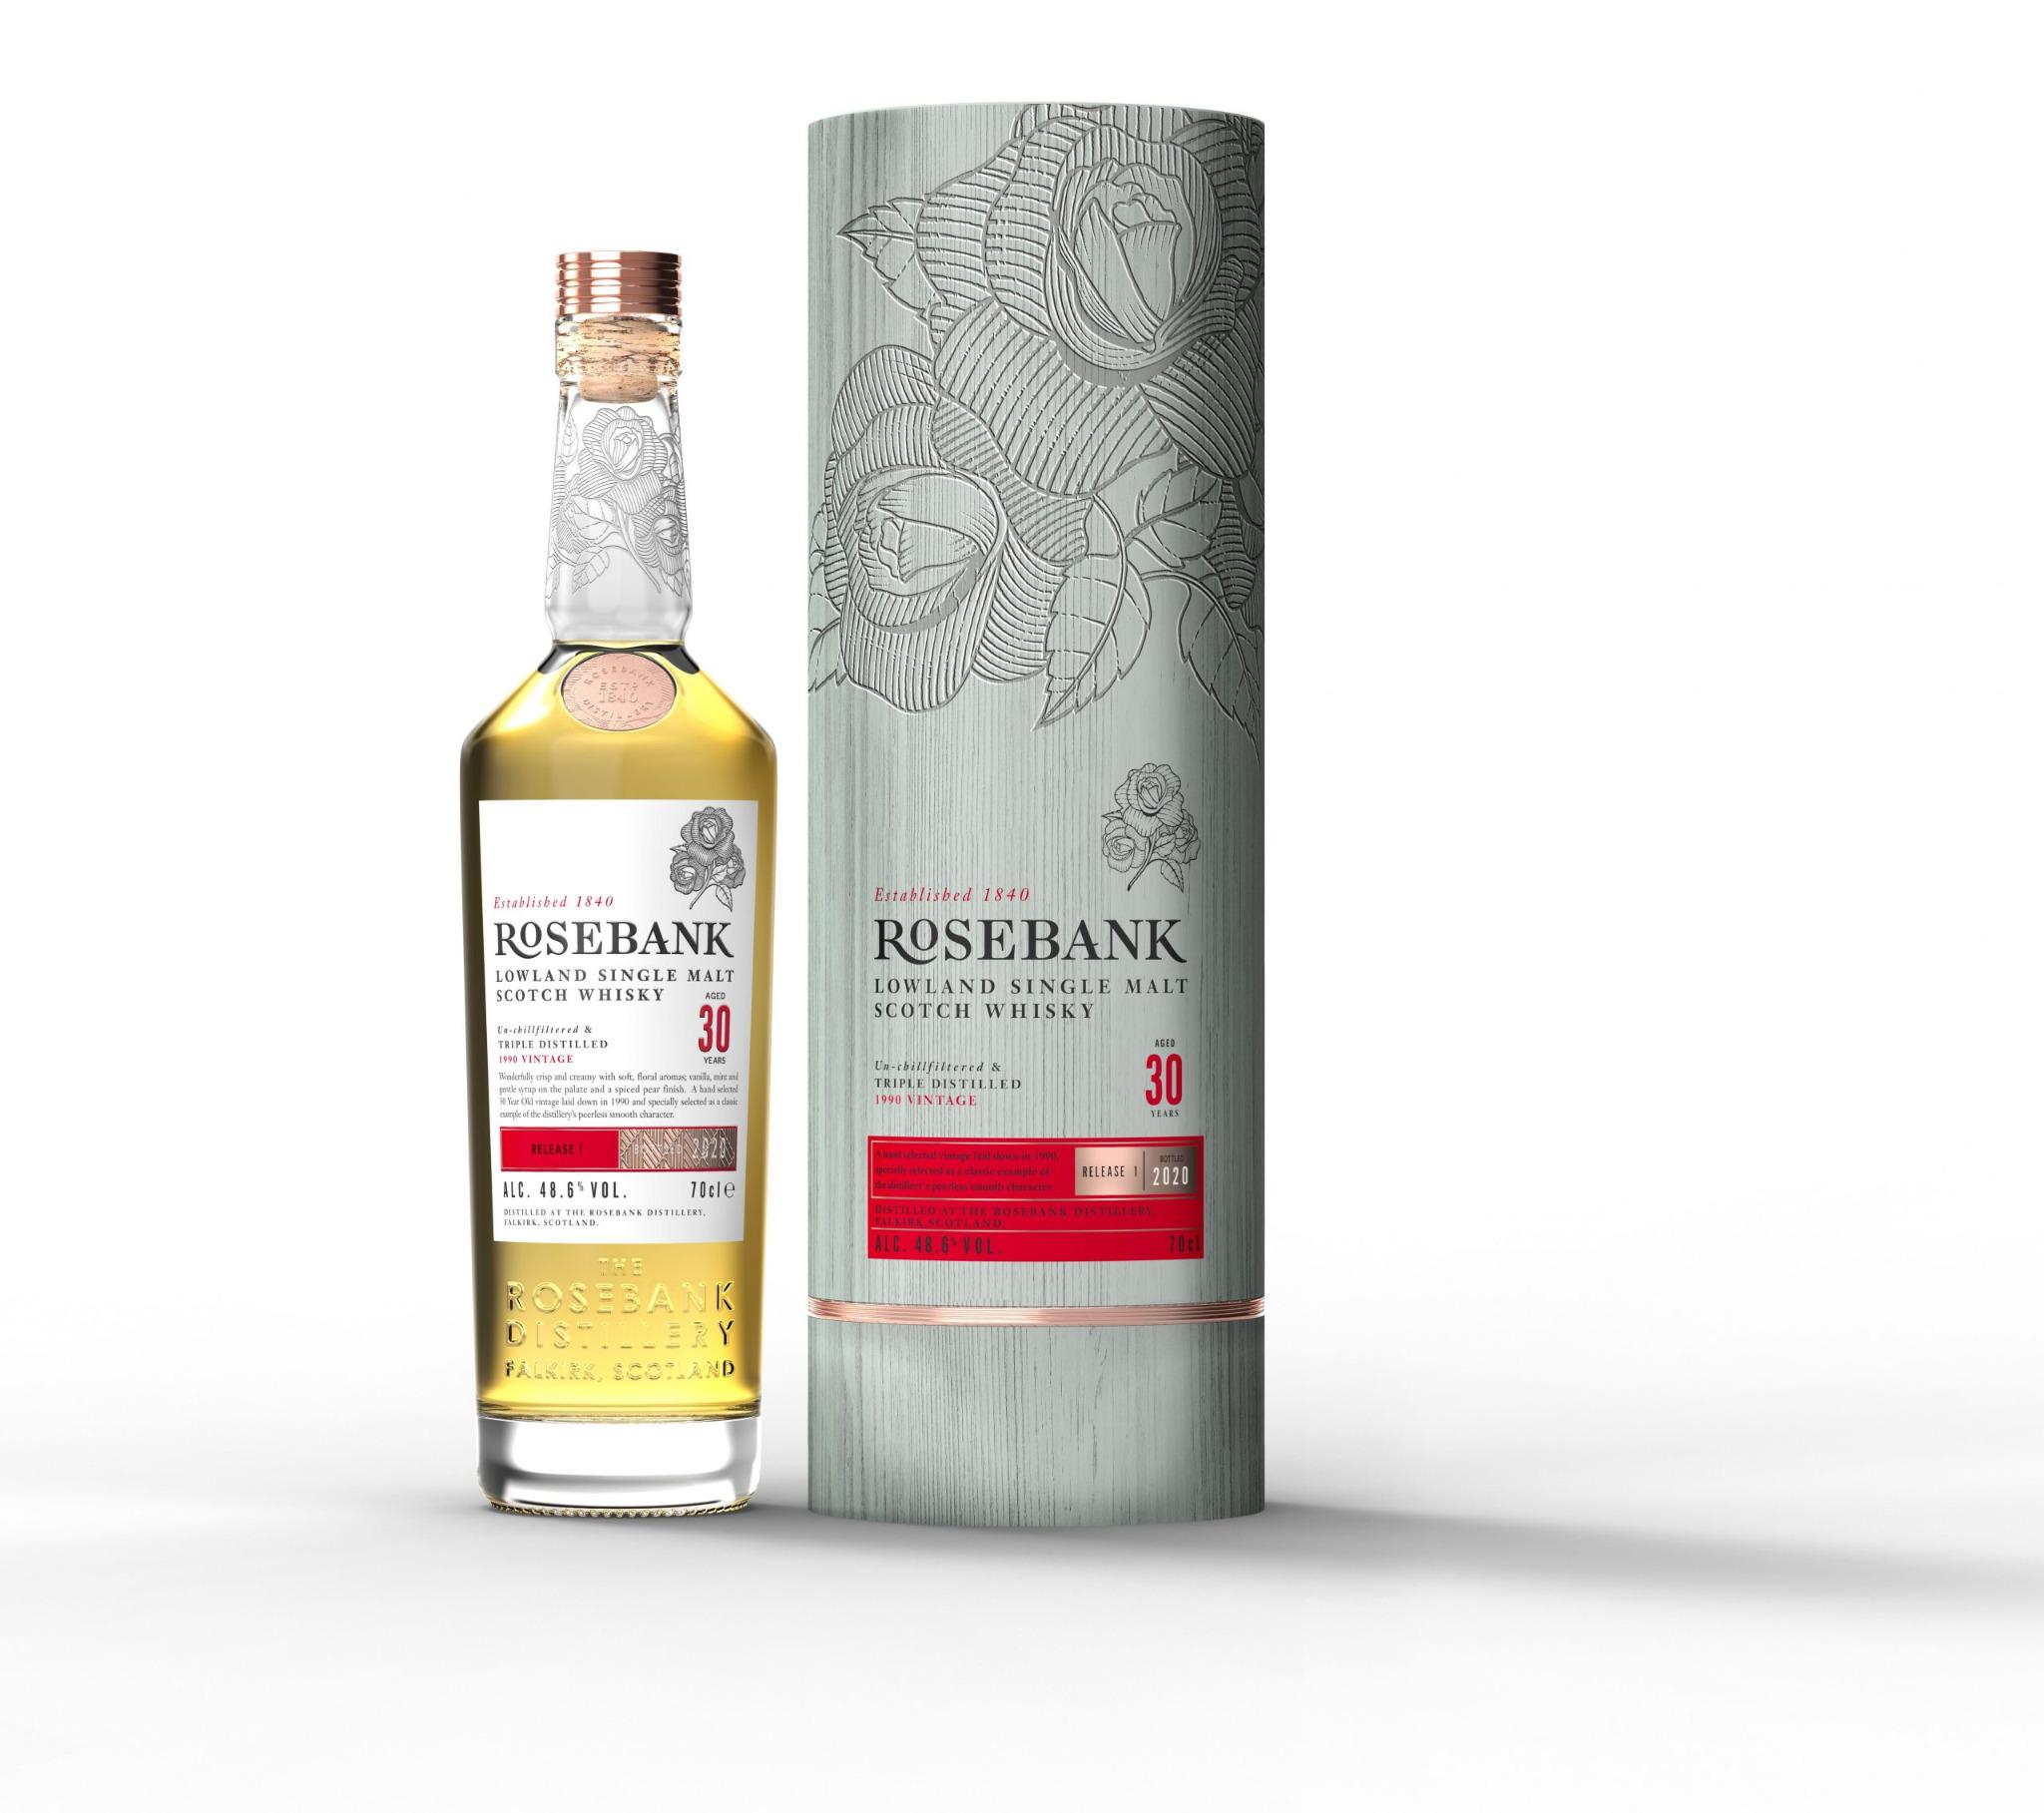 ROSEBANK-Single-Malt-Scotch-Whisky_30-YEAR-OLD-scaled.jpg